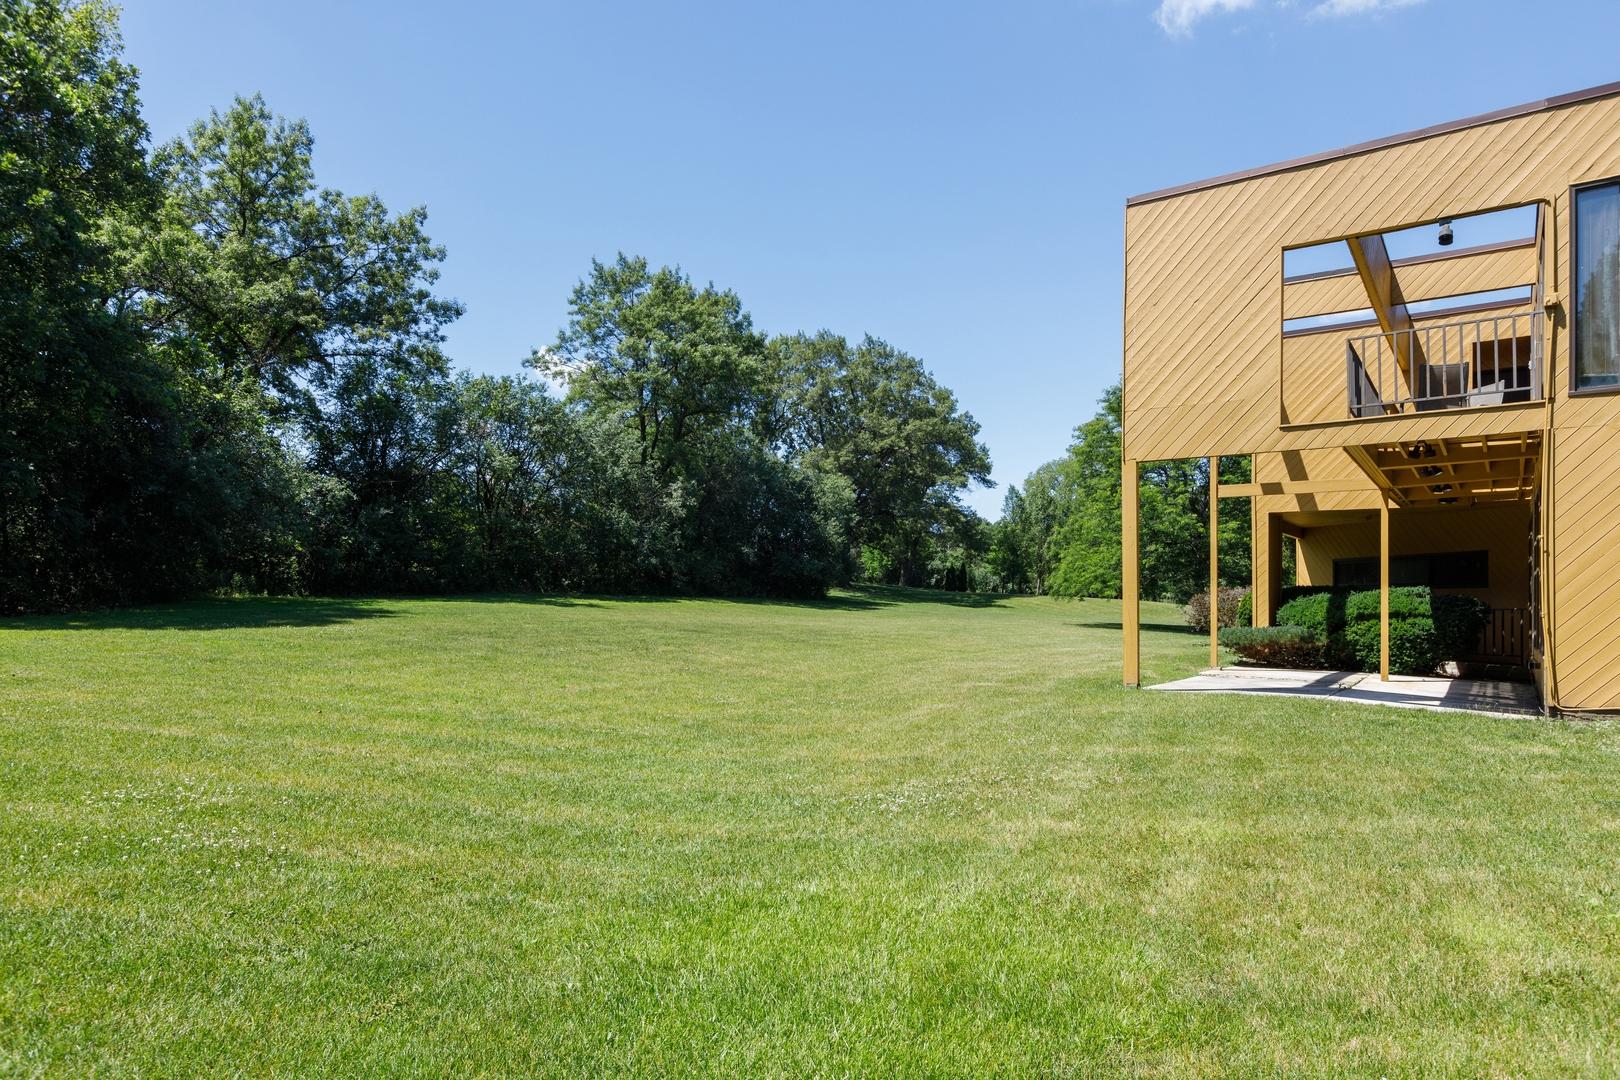 217 Indian Trail, Oak Brook, Illinois, 60523